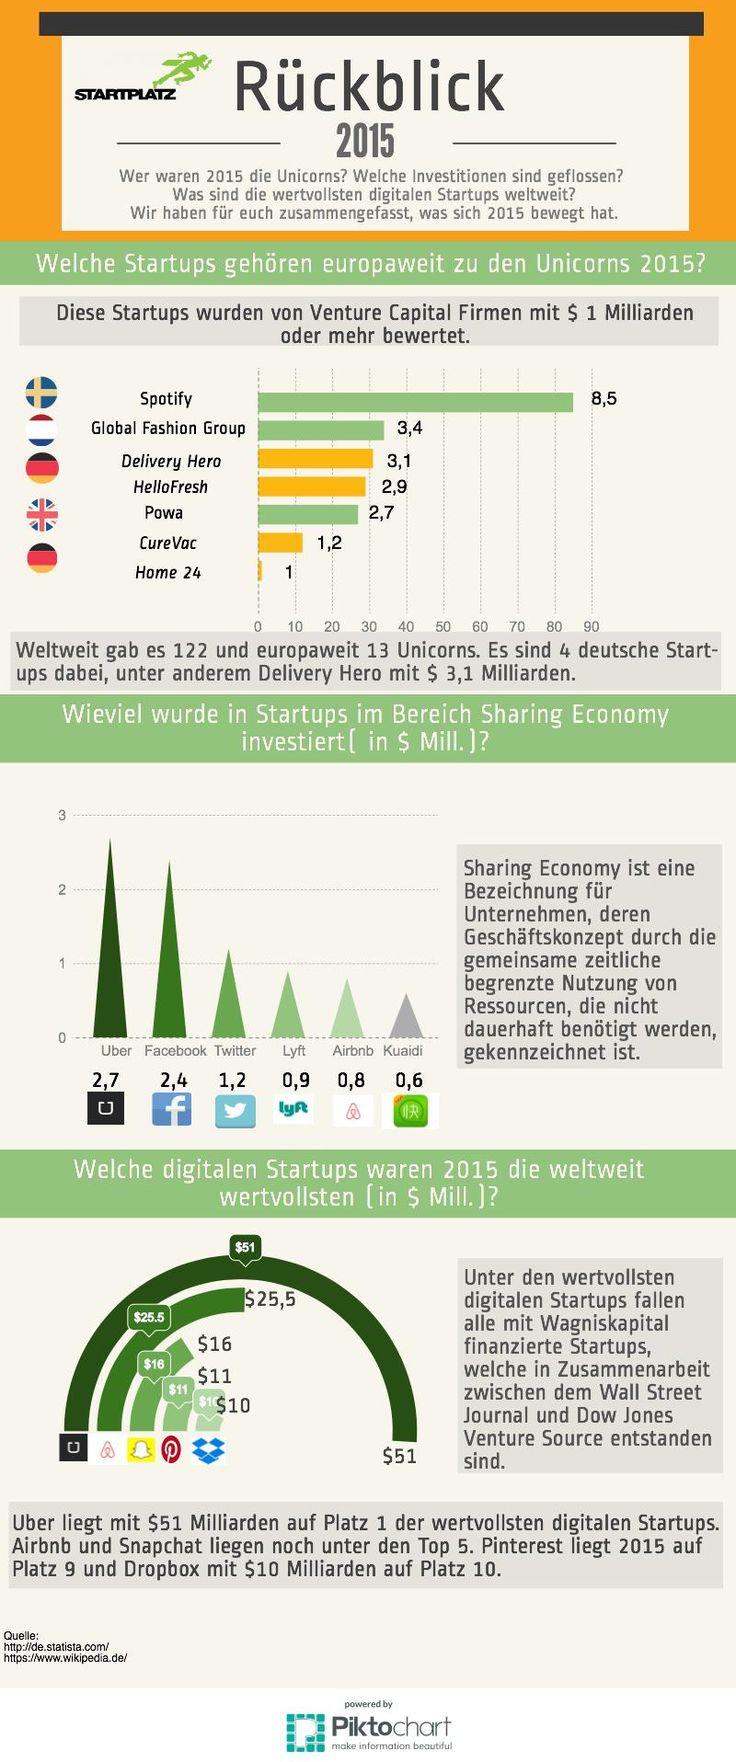 Startup Rückblick 2015  #startplatz #Rückblick #startup